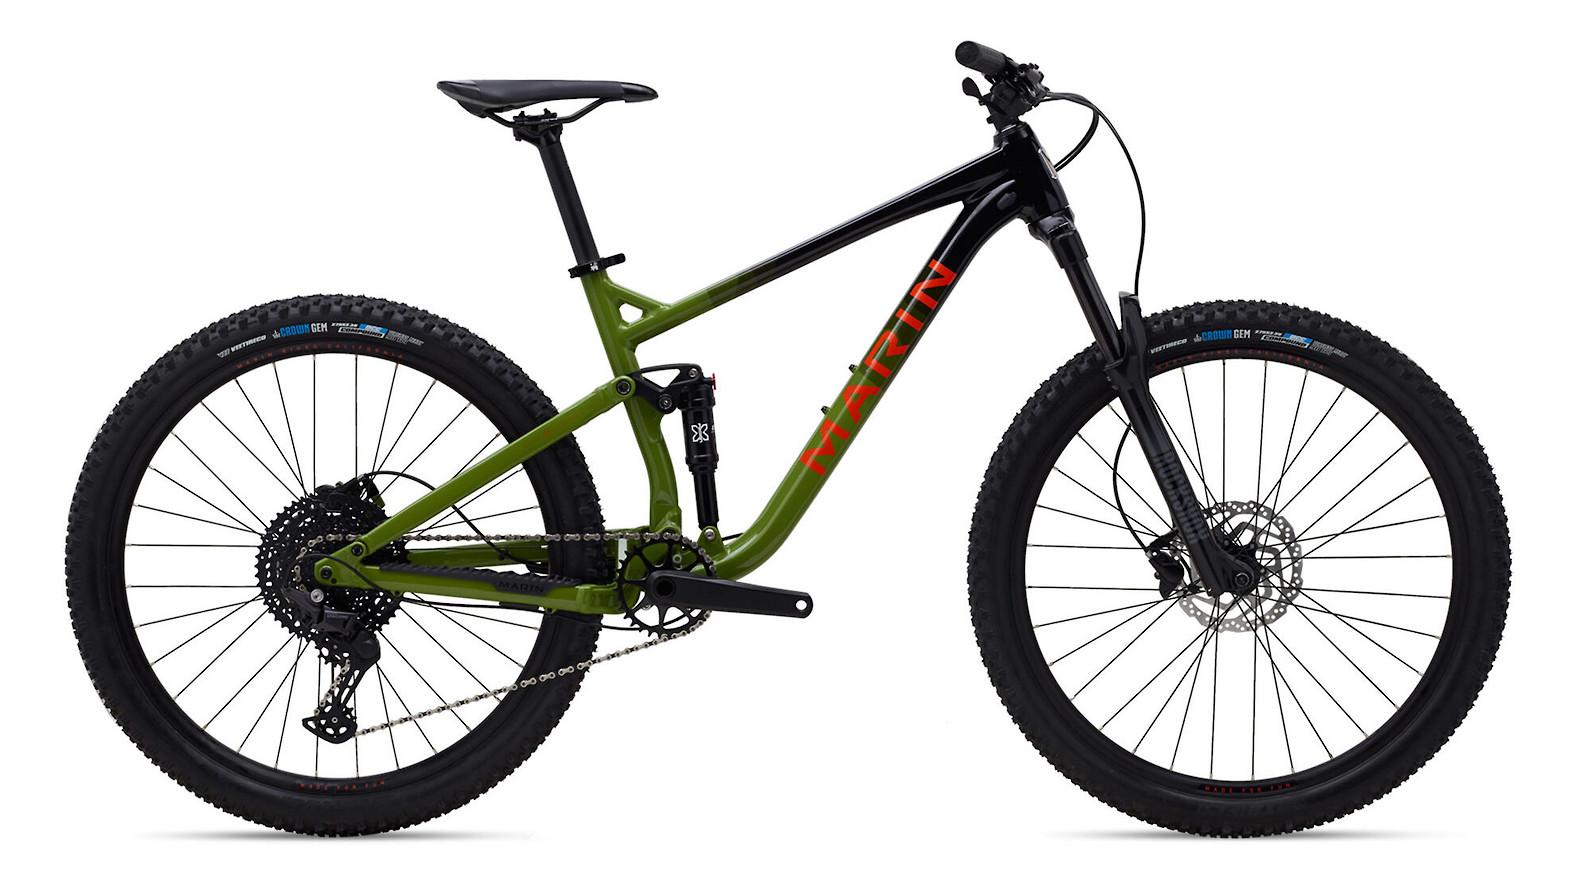 2021 Marin Rift Zone 27.5 1 (Gloss Black/Green/Orange)